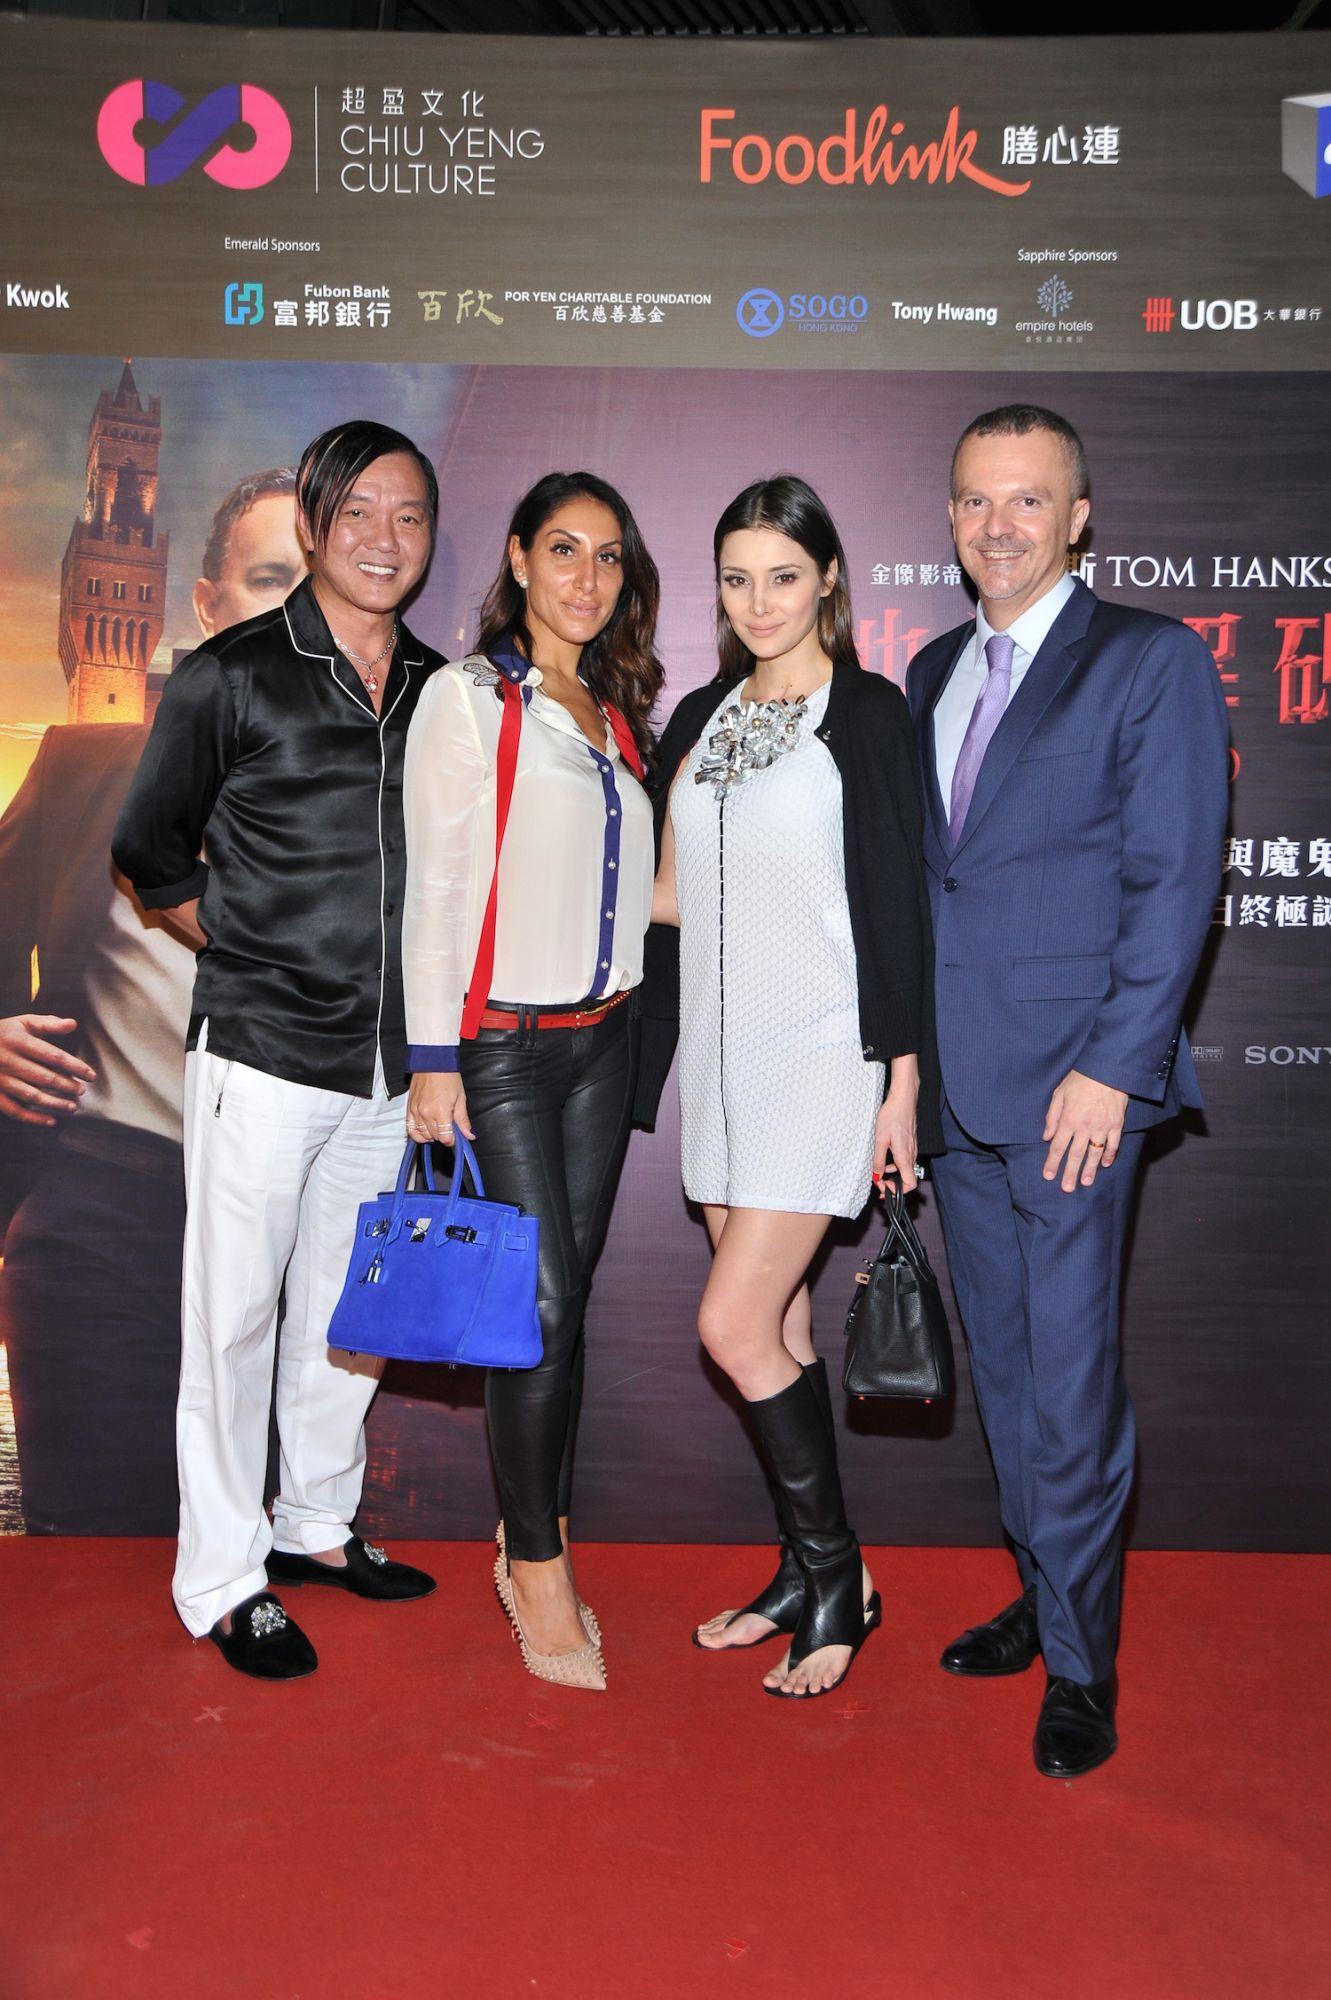 Stephen Hung, Miriam De Riu, Deborah Hung and Antonello De Riu